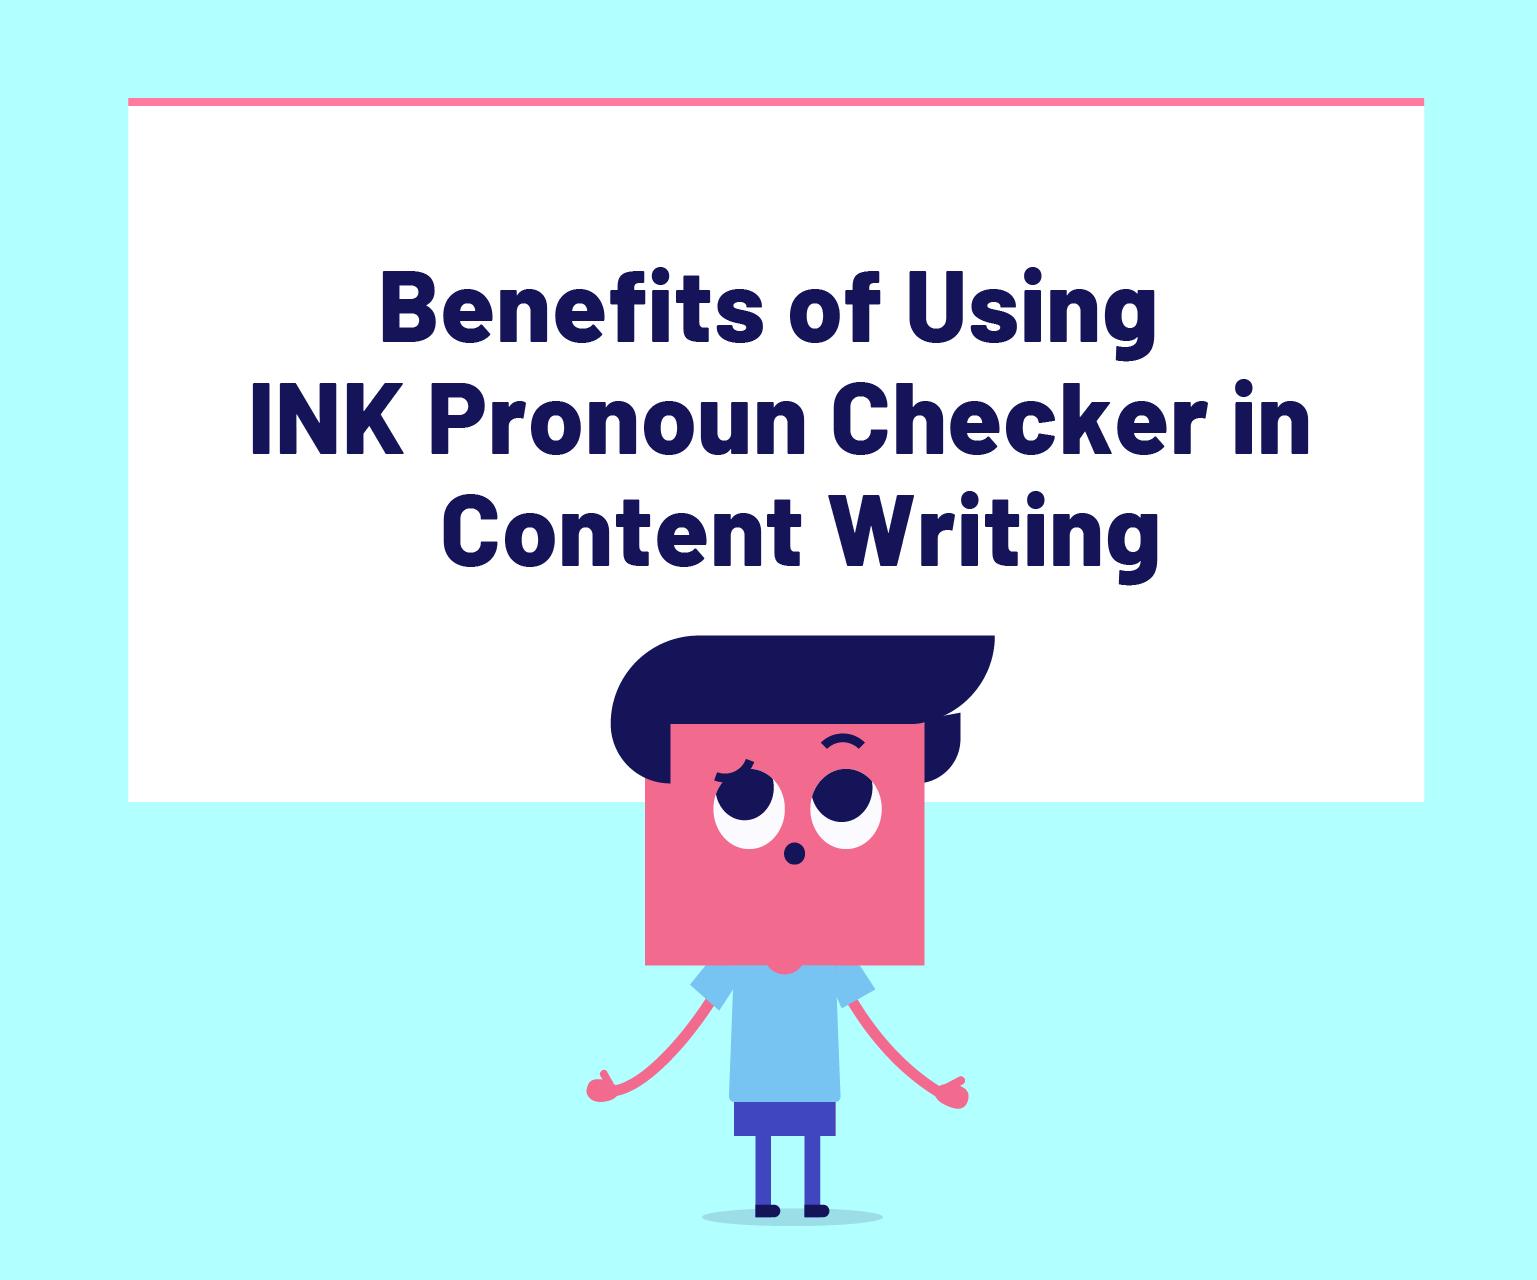 Benefits of using ink pronoun checker